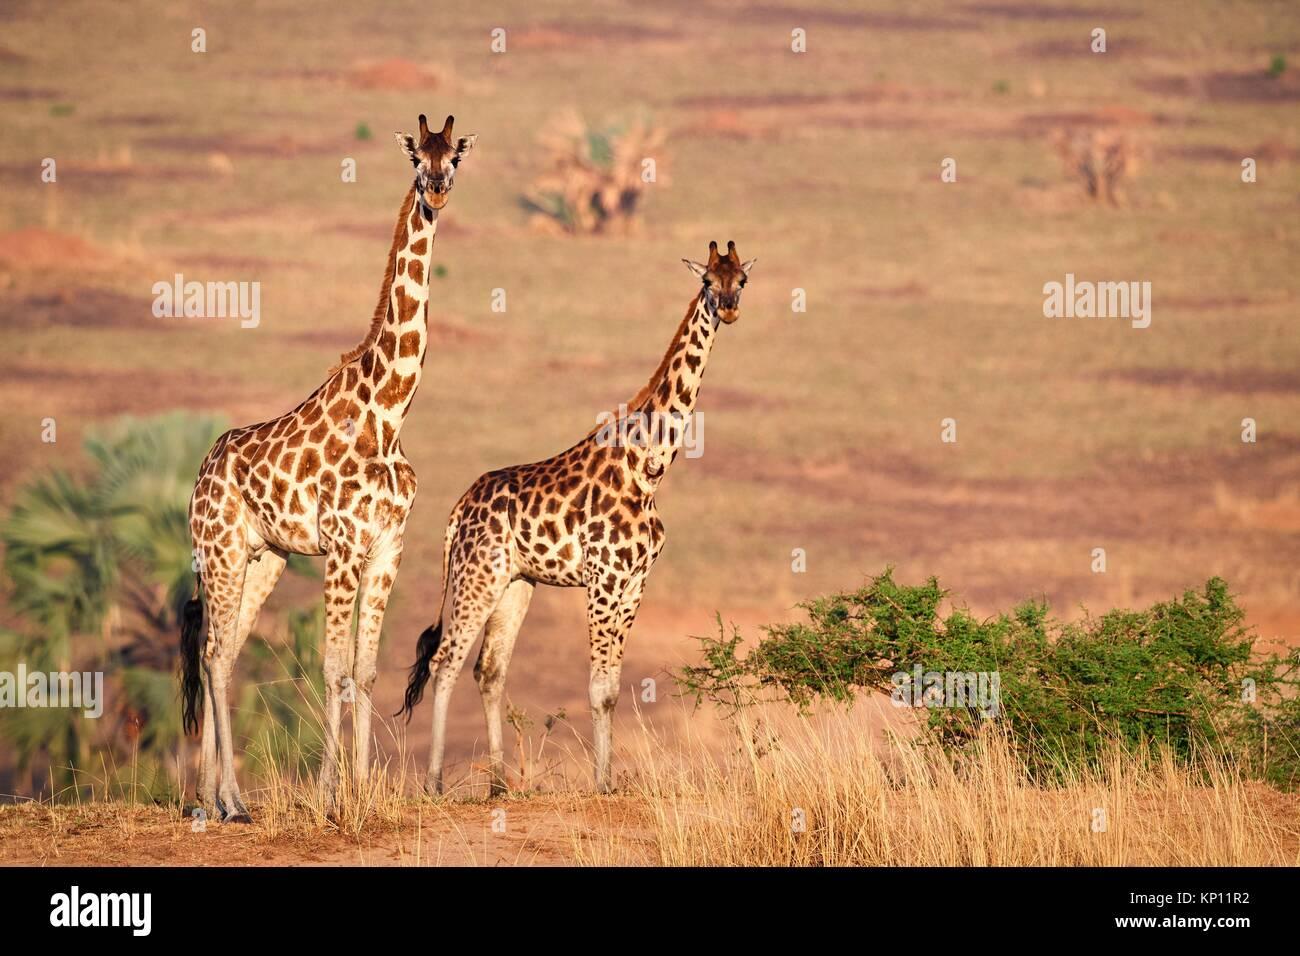 Rothschild's giraffe (Giraffa camelopardalis rothschildi) female in Murchisson Falls National Park, Uganda. - Stock Image